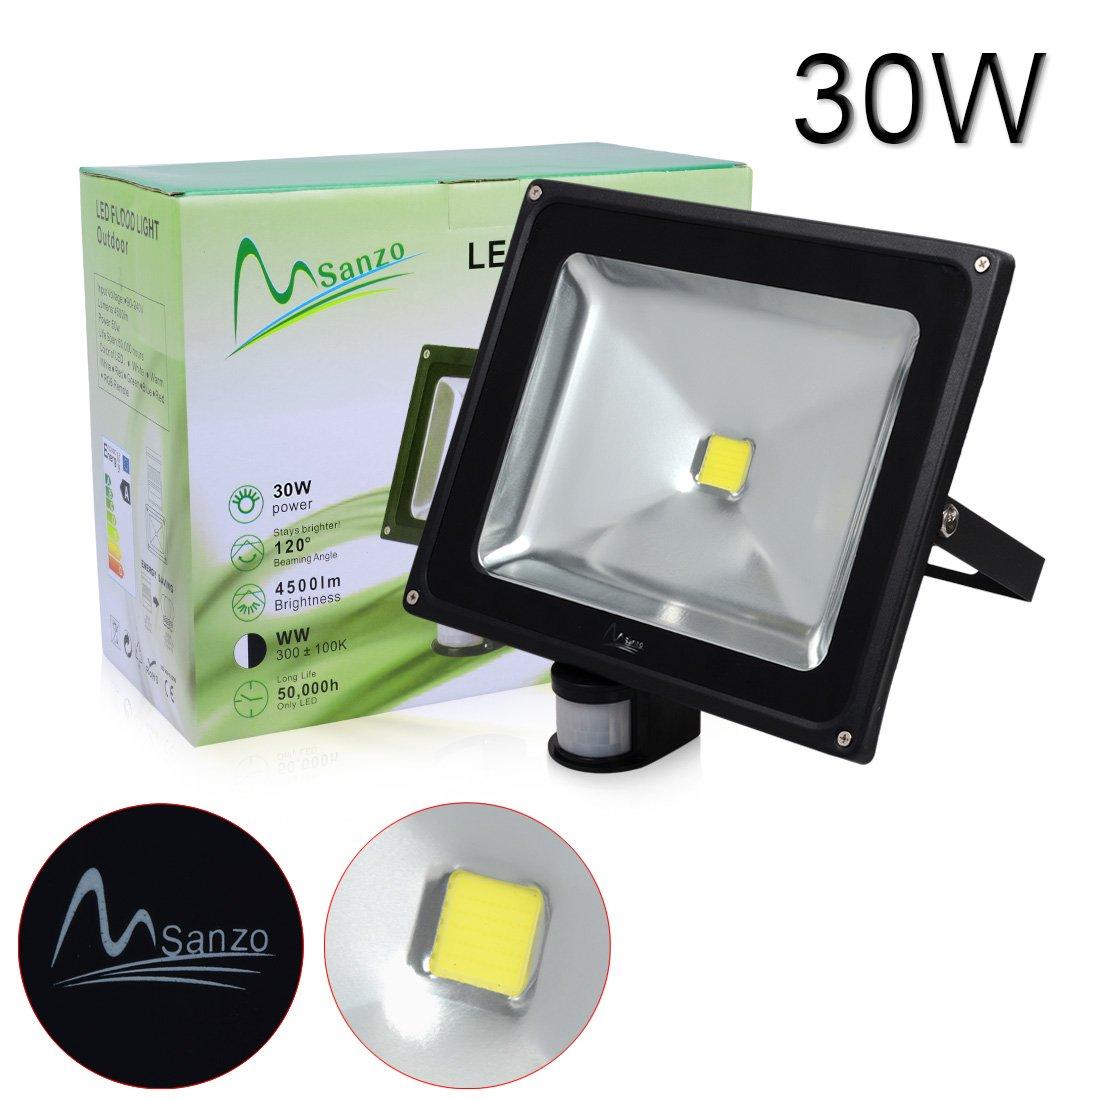 Porpora 30W LED Security Flood Light (1 pack) Ideal for outdoor lighting such as Parking lot lighting, Construction building, Advertisement billboard, Landscape